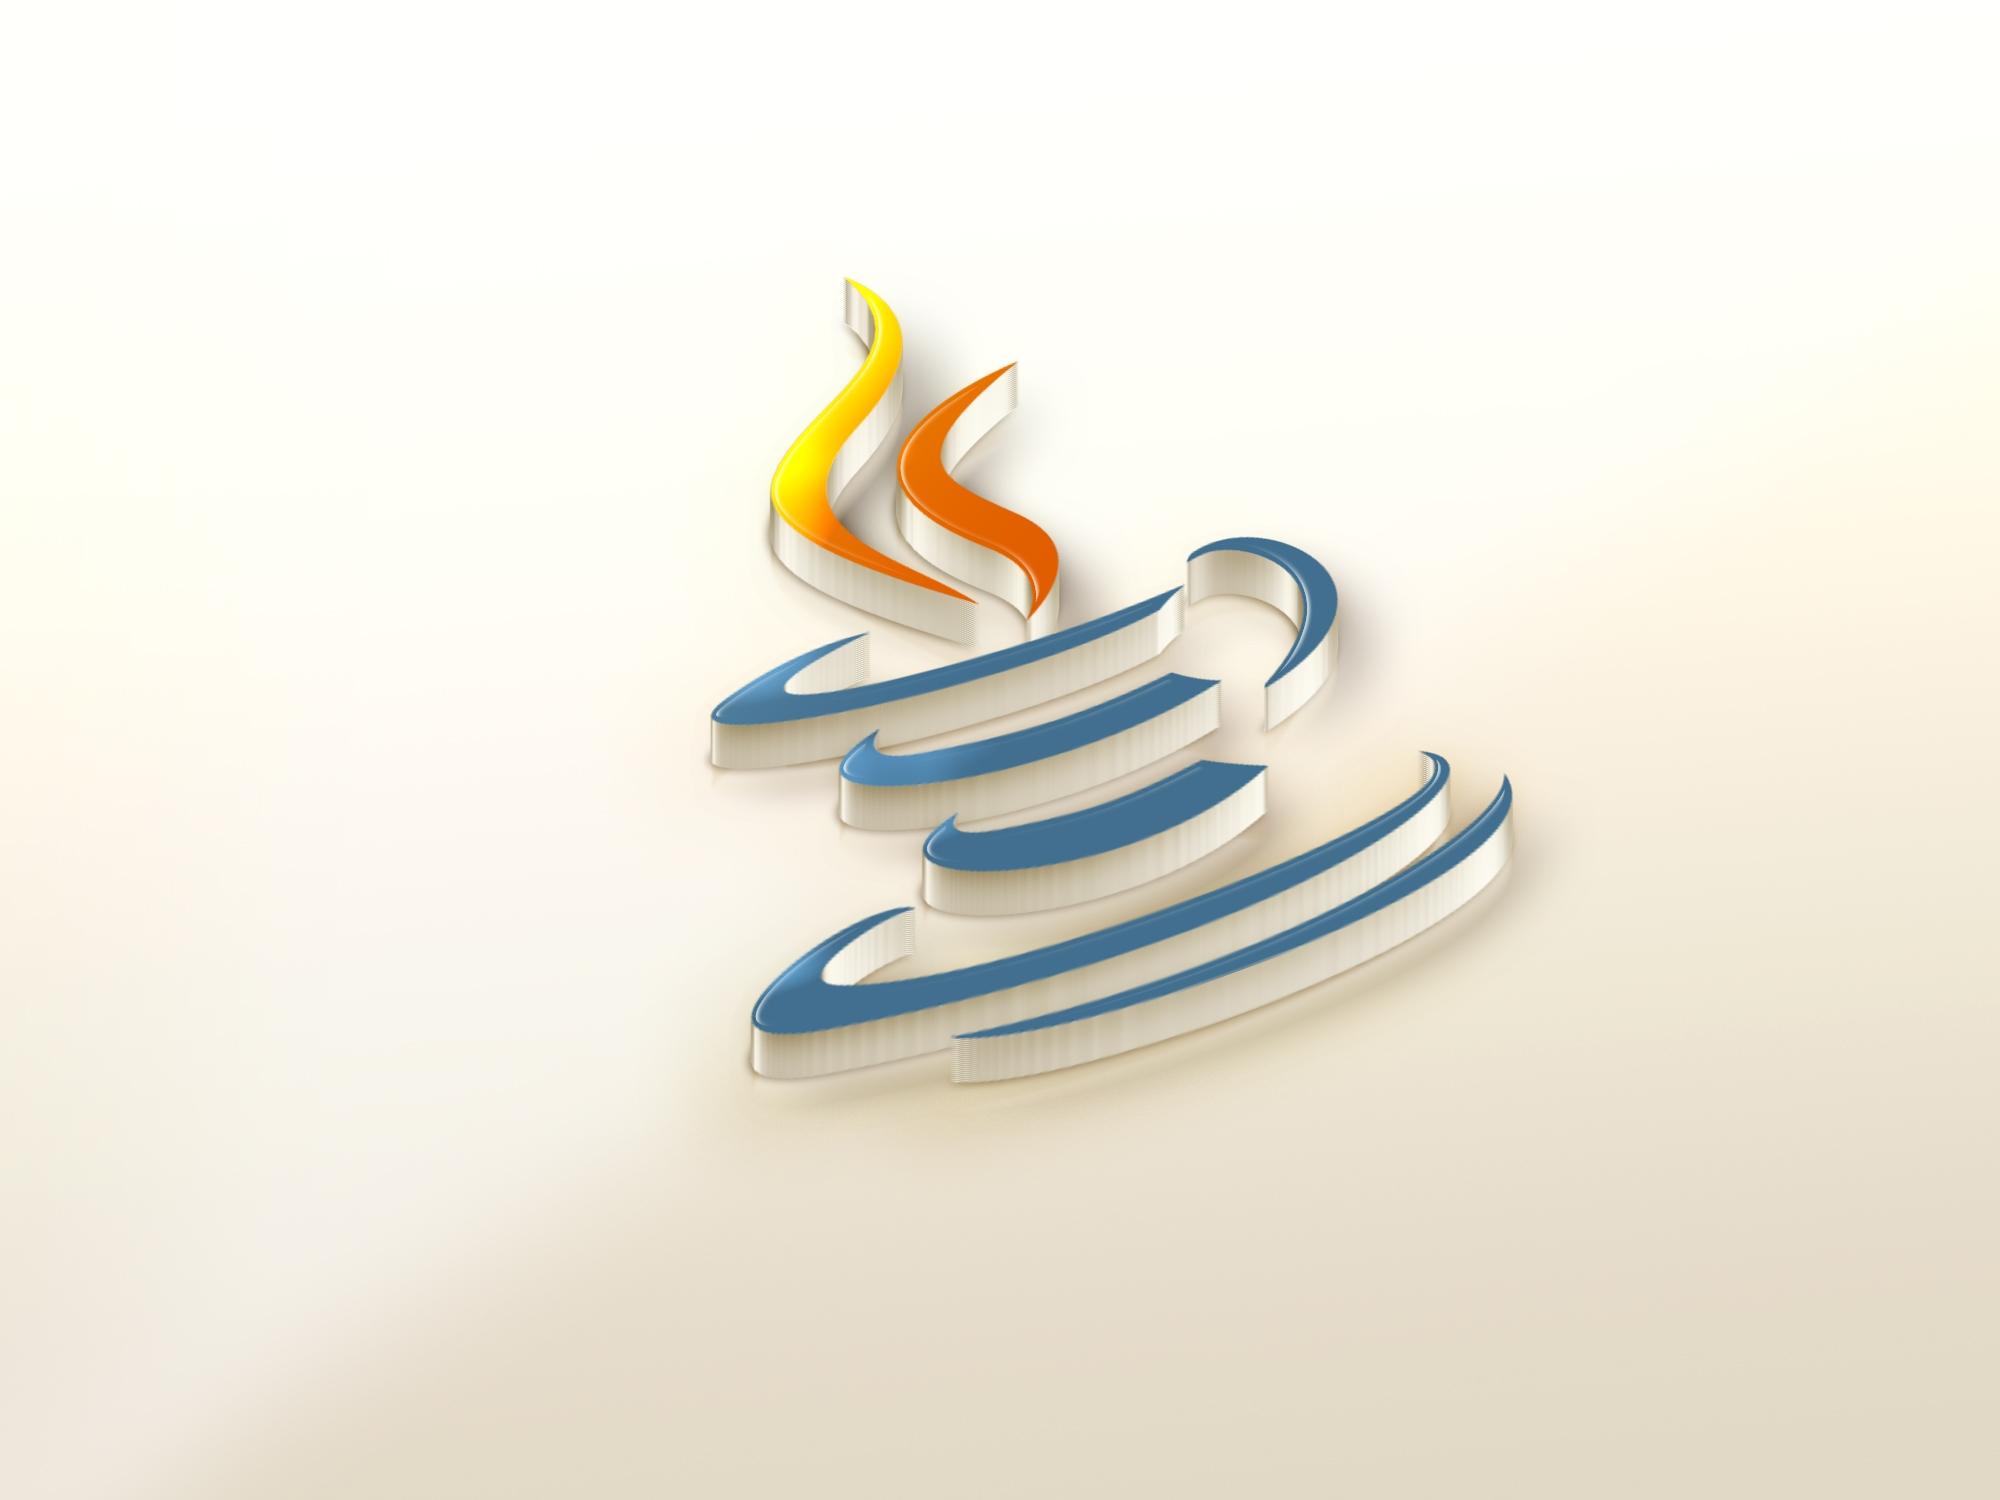 Java symbol image